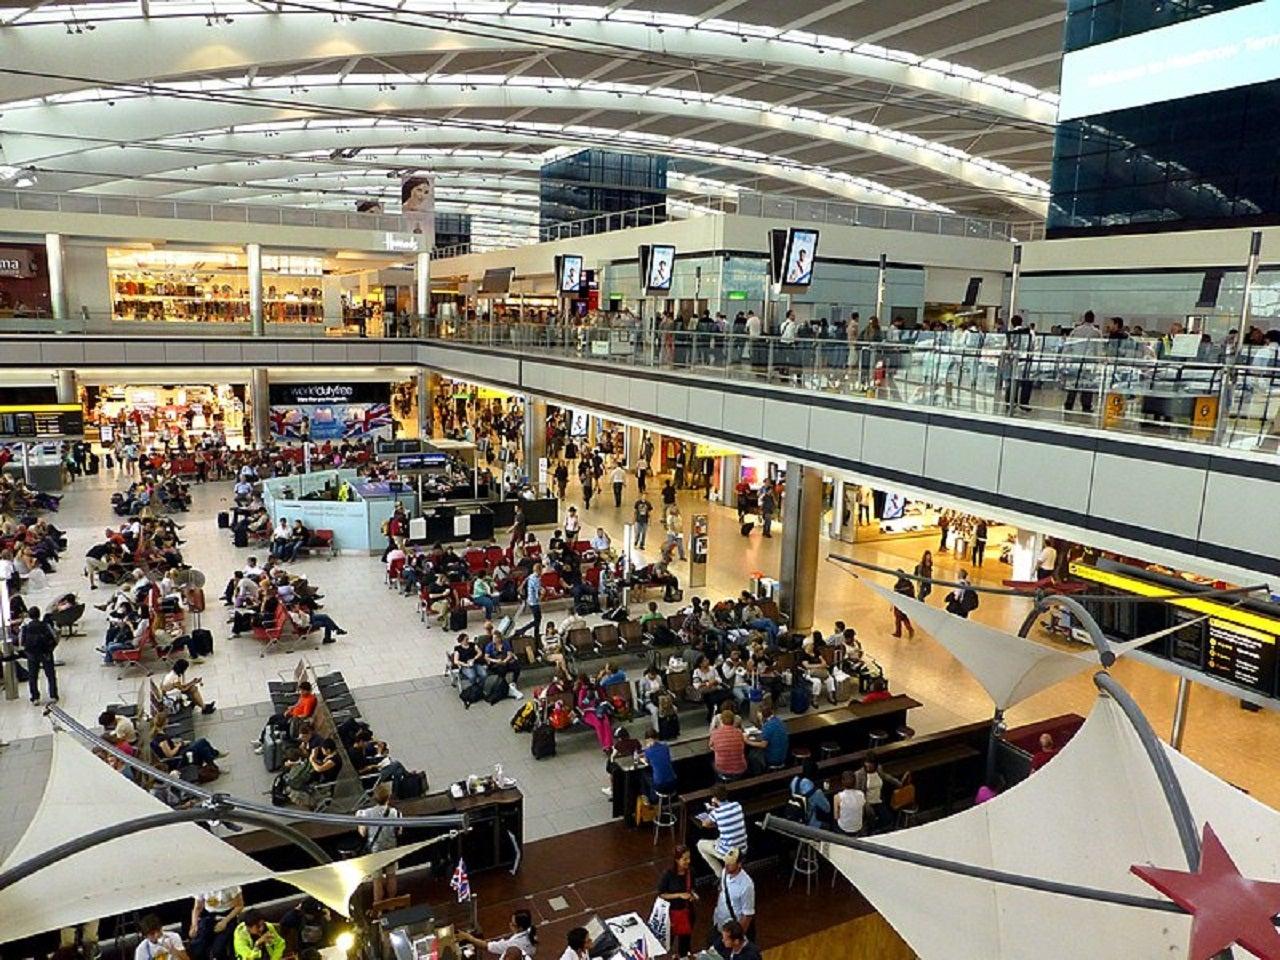 Heathrow Airport reports 72.7% decrease in passenger traffic in 2020